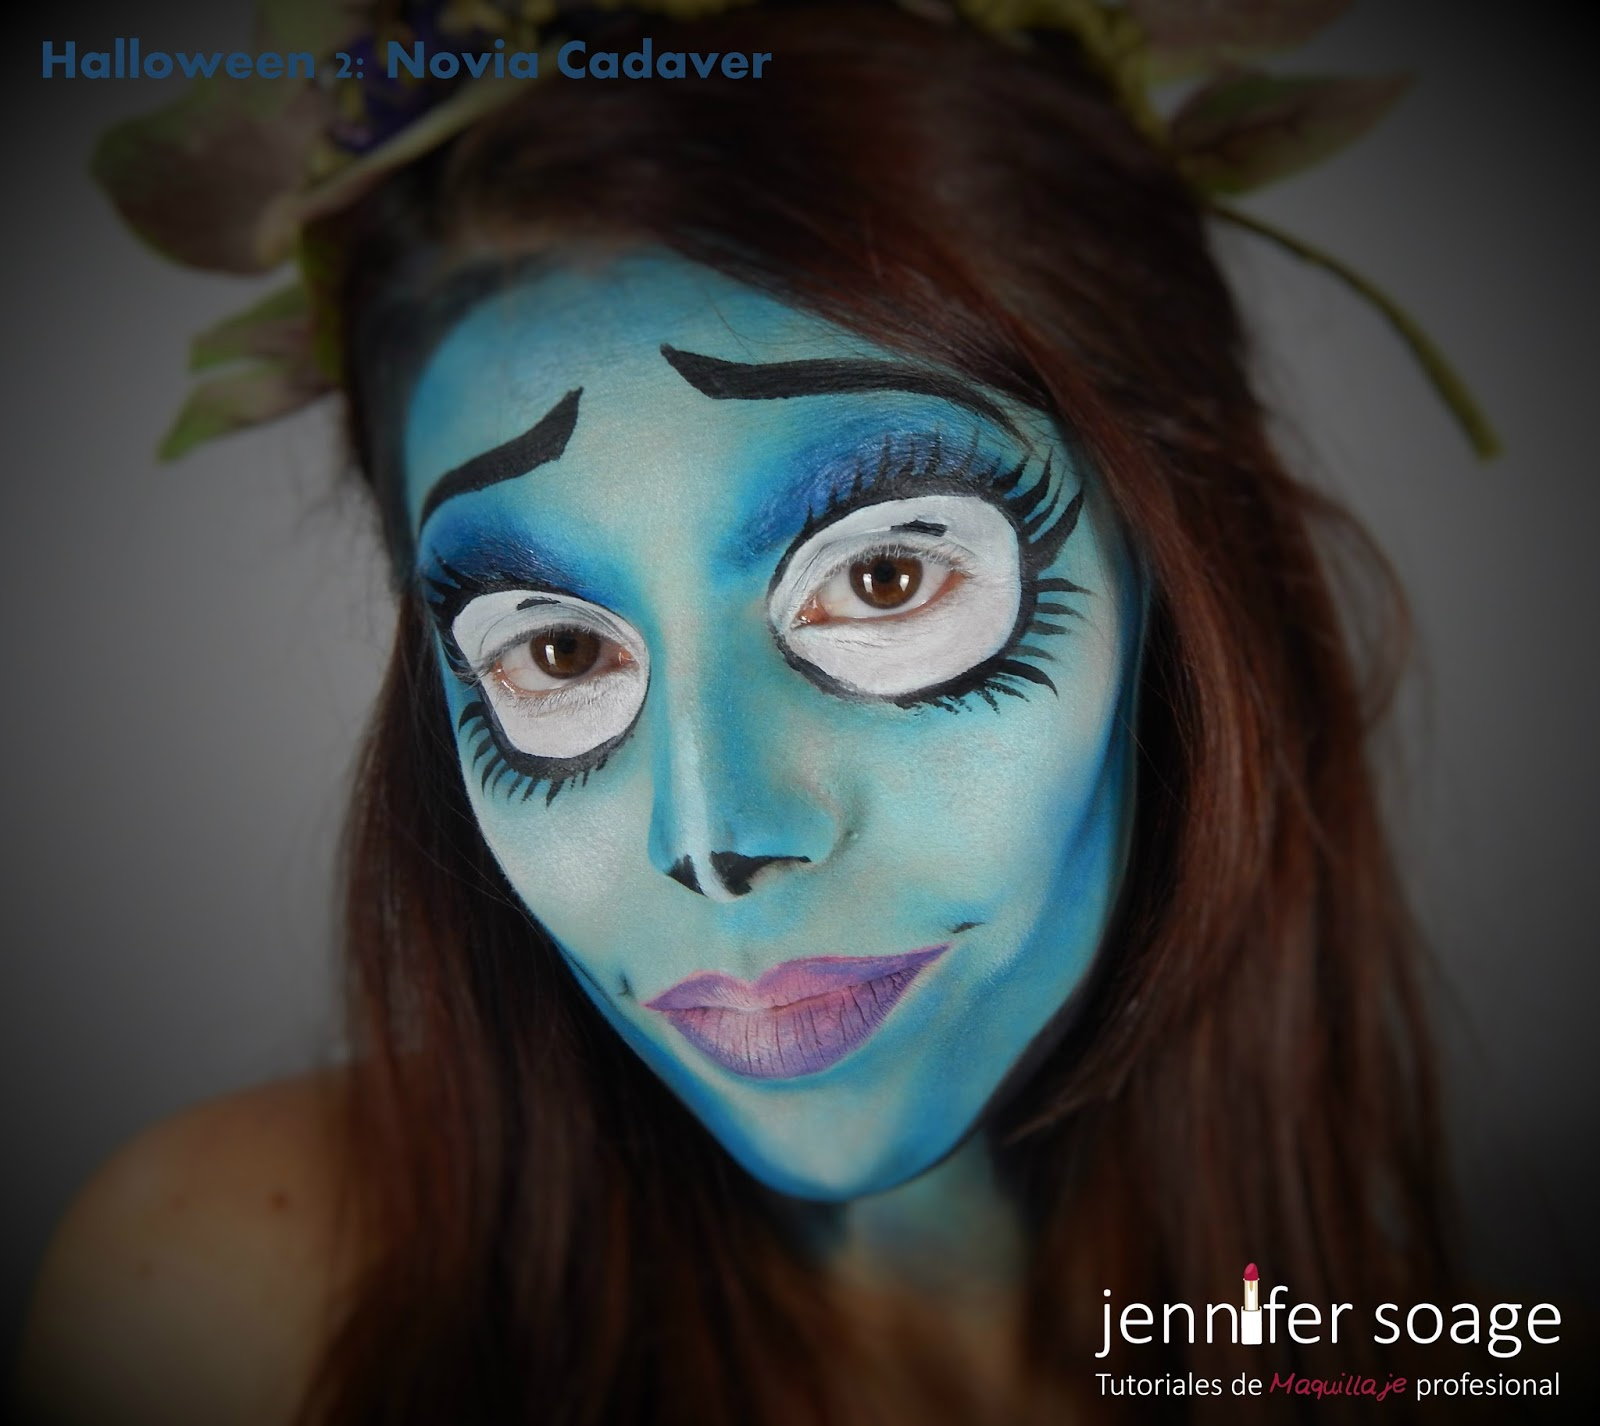 Maquillaje Halloween Novia Cadaver. Gallery Of Img With Maquillaje ...